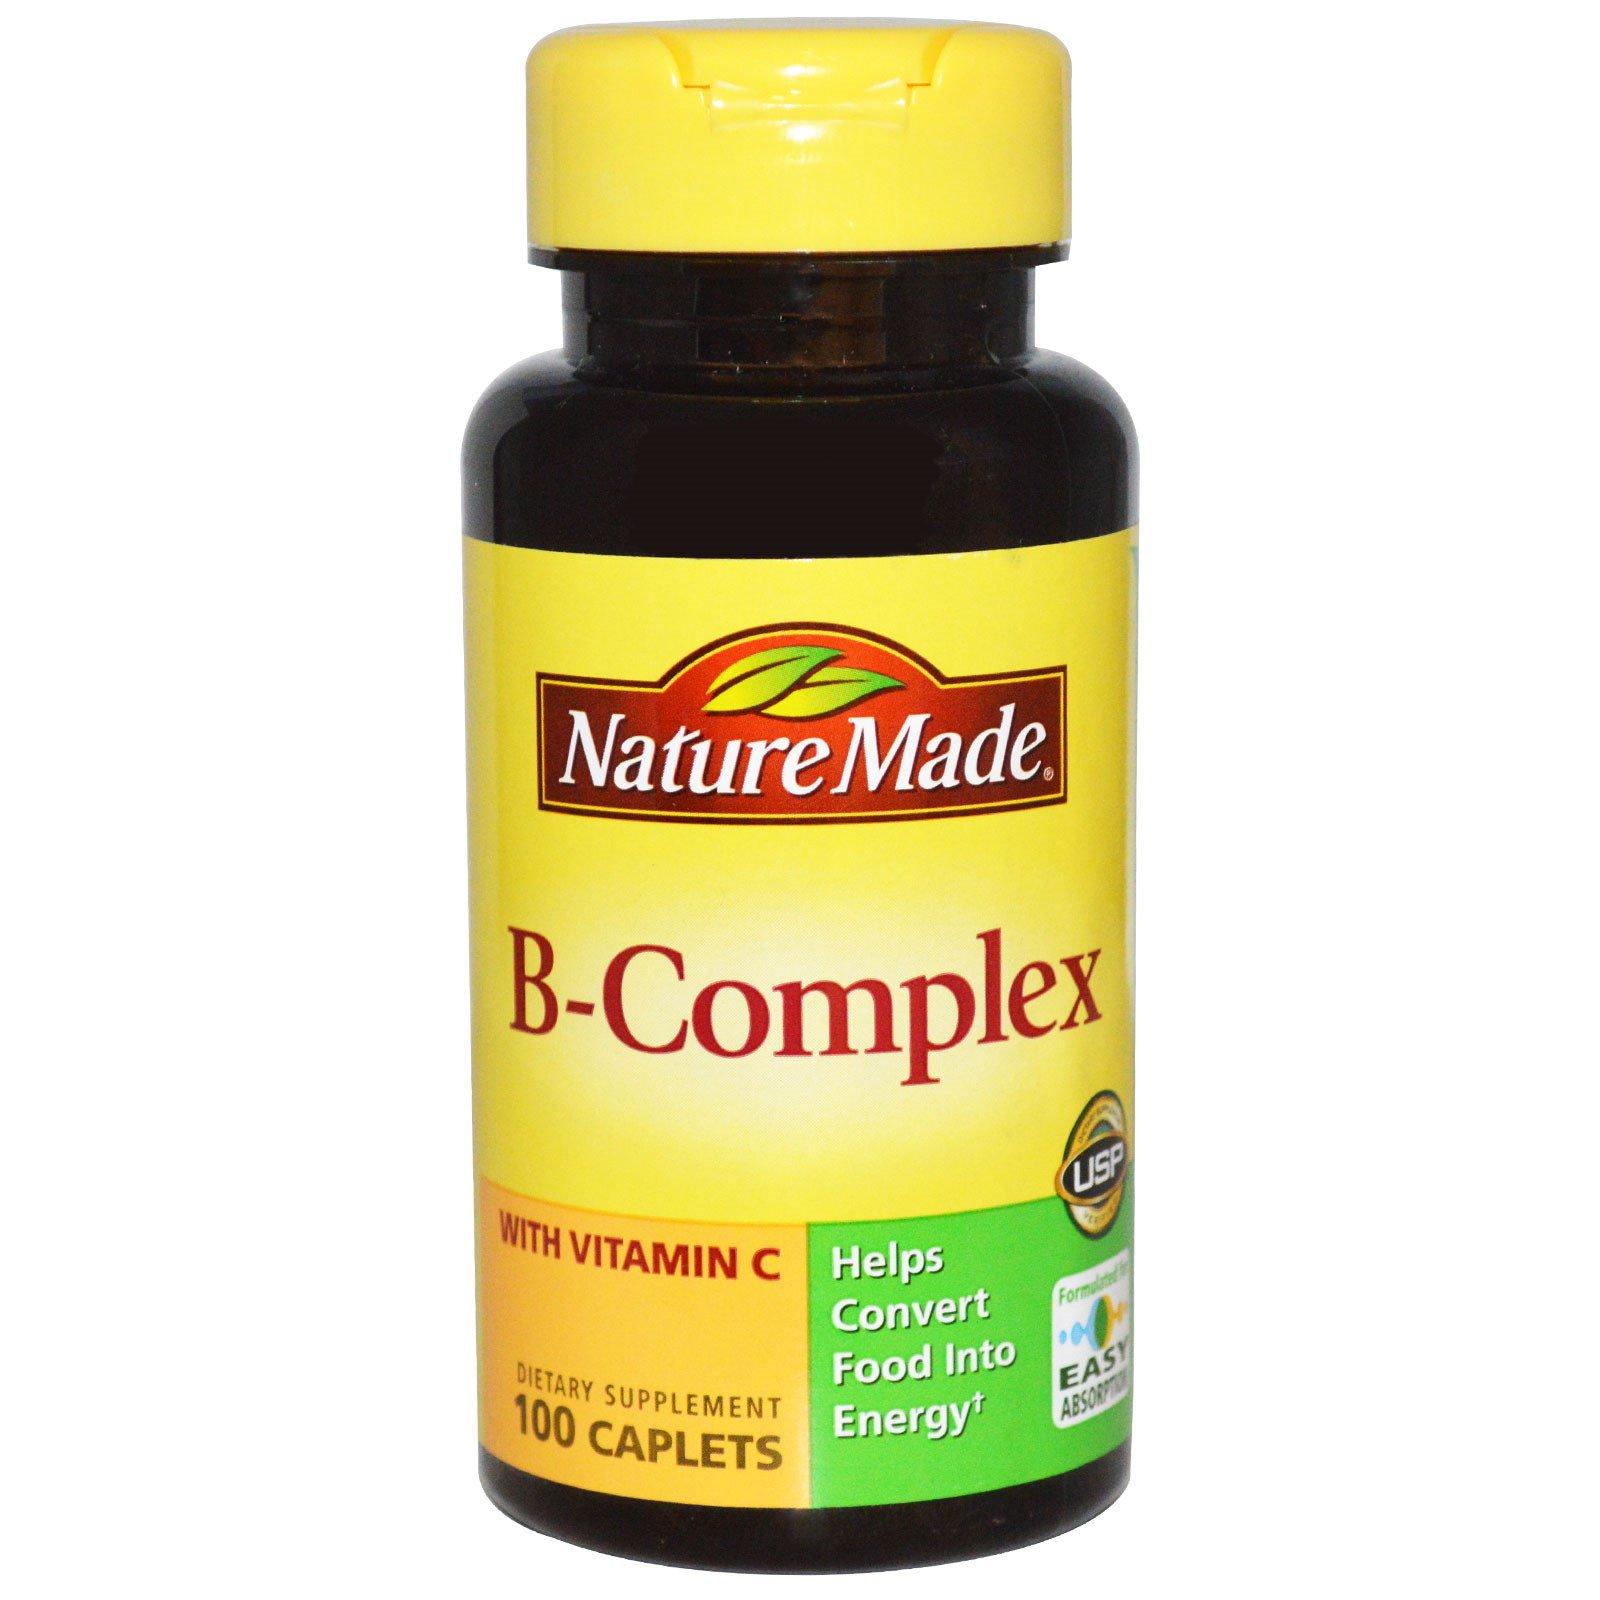 Nature Made, B-Комплекс с витамином C, 100 капсуловидных таблеток